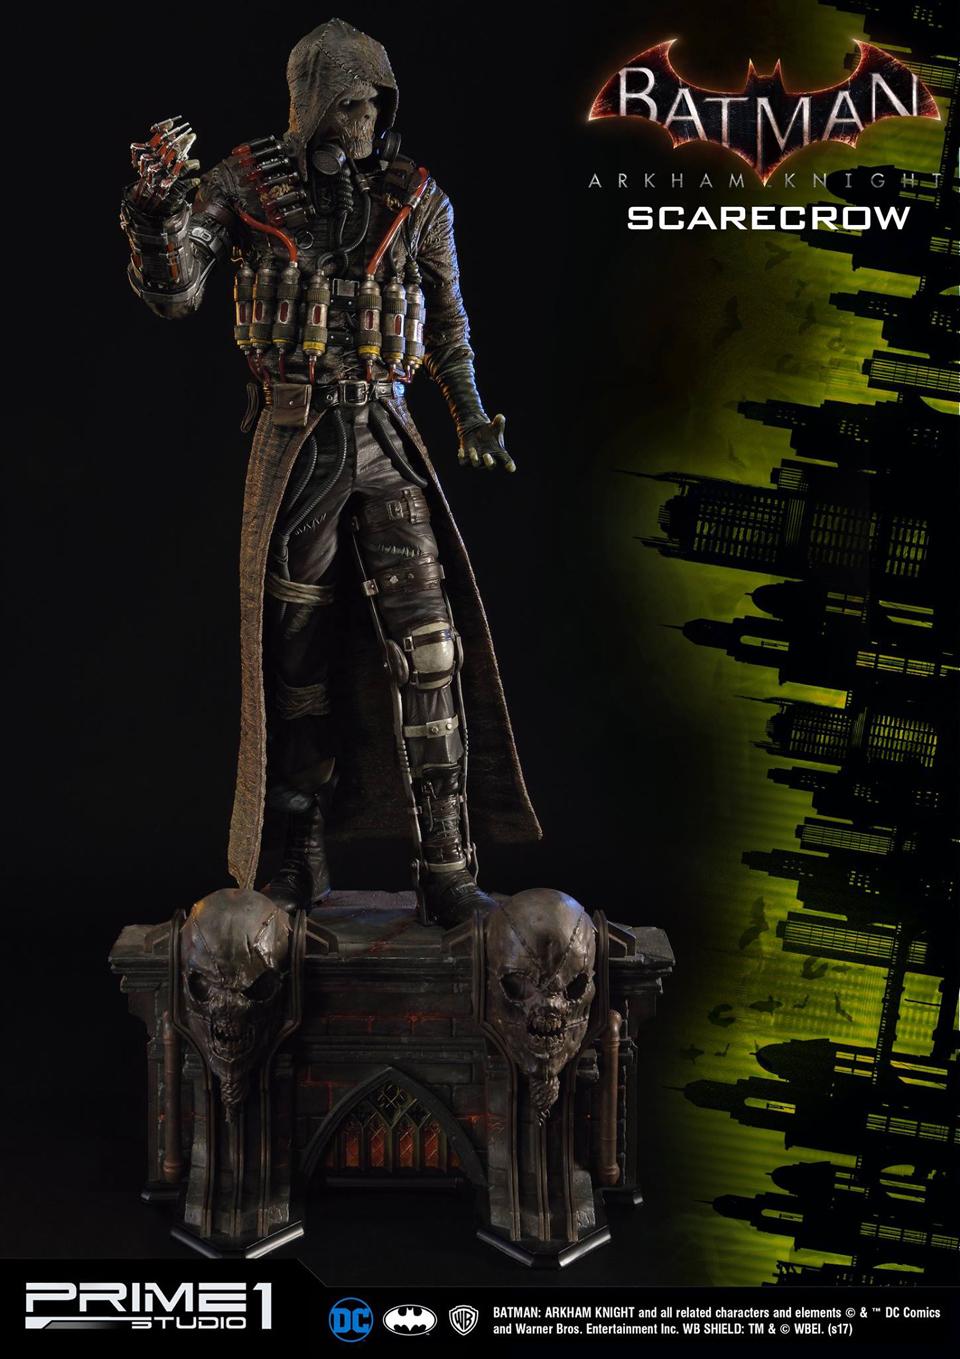 Prime 1 Batman: Arkham Knight Scarecrow Statue